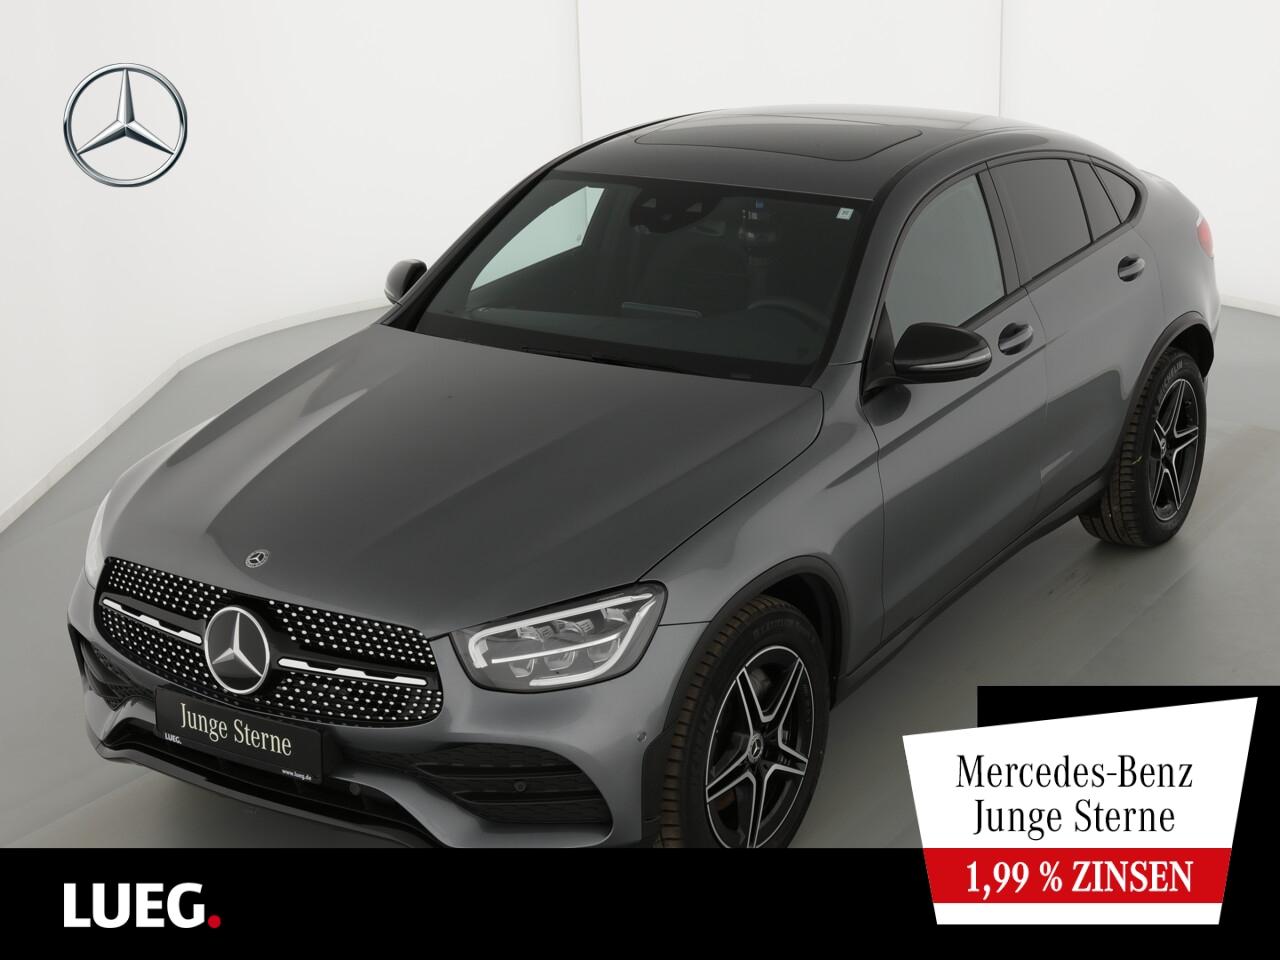 Mercedes-Benz GLC 300 4M Coupe AMG+MBUX+Navi+SHD+LED+Distr+RFK, Jahr 2020, Benzin